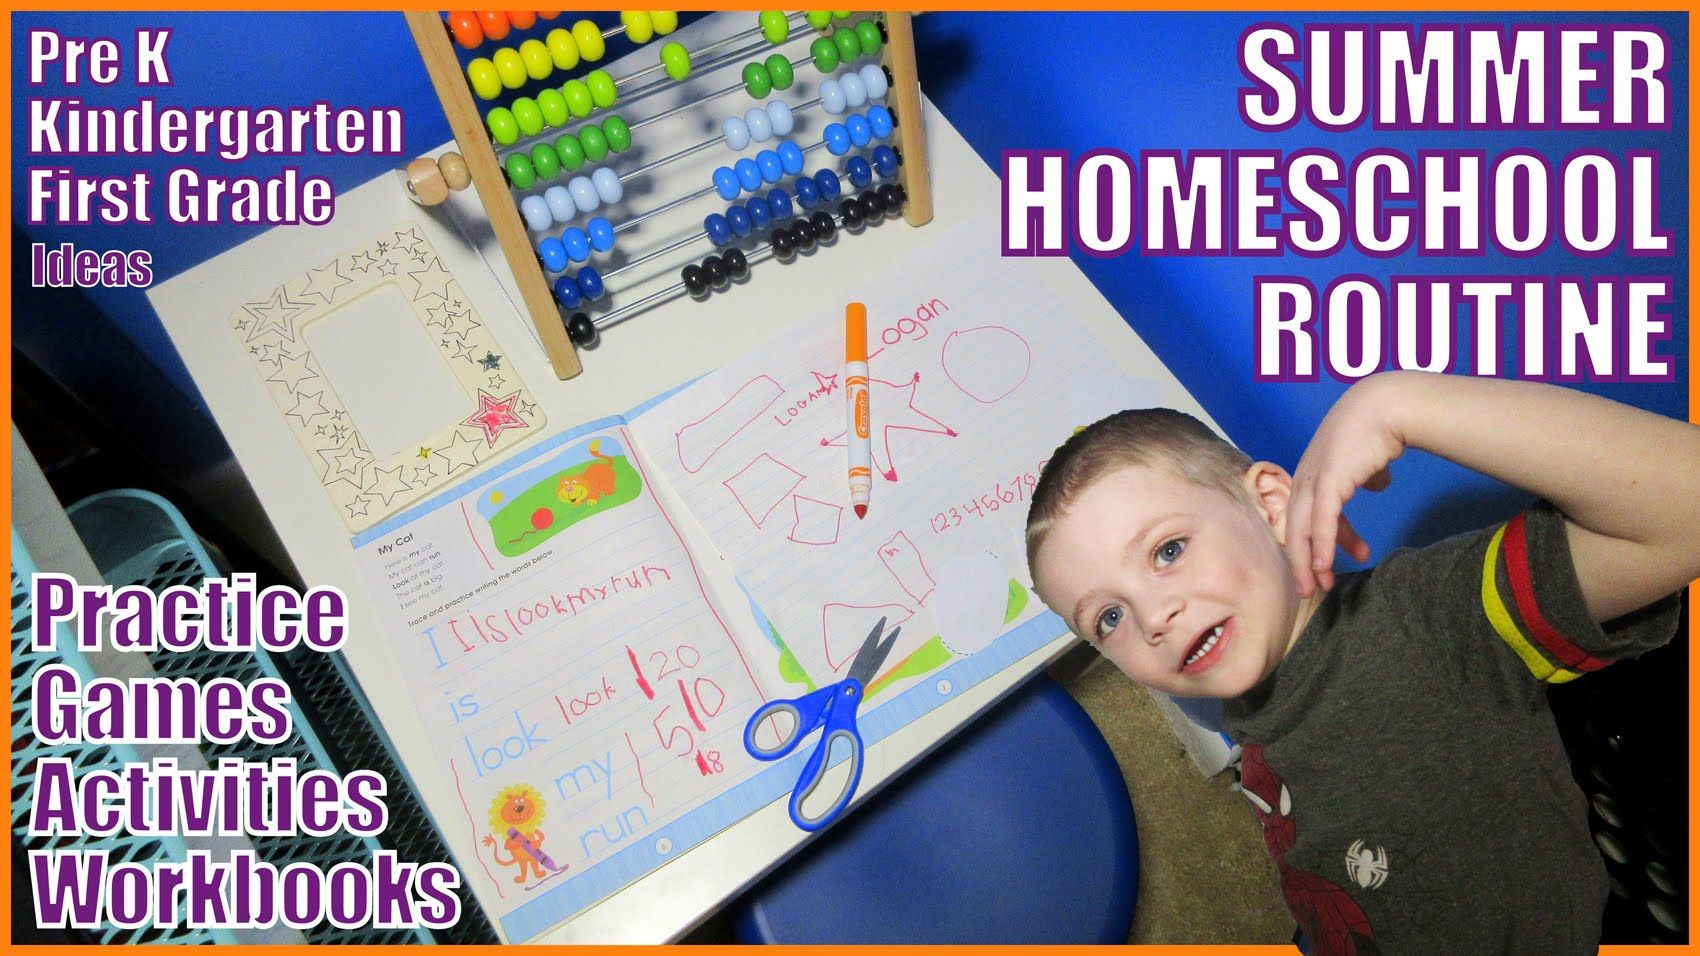 Our Homeschool Summer Routine Practice